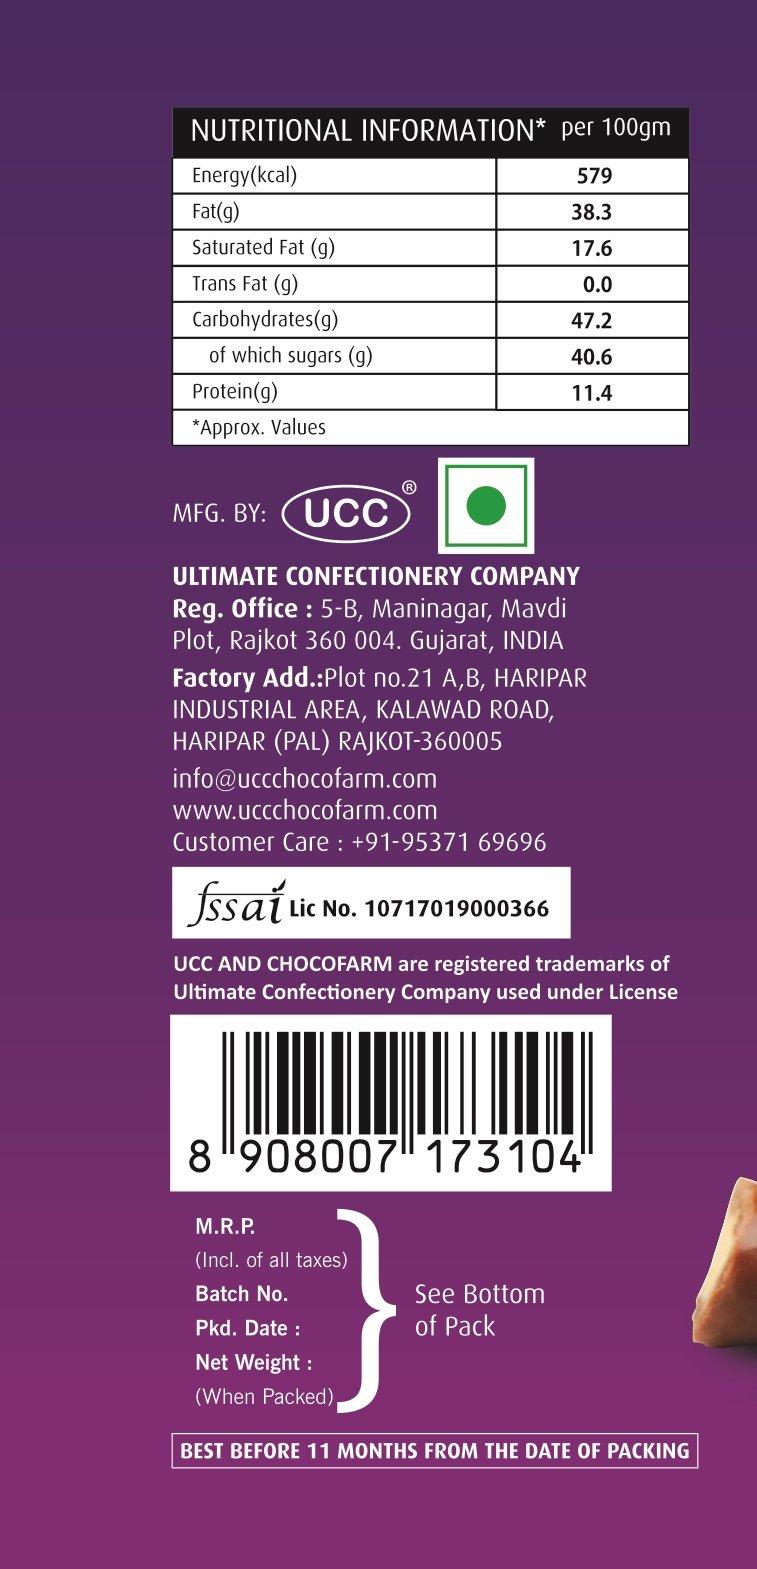 Chocolate almonds (96 GMs) - Unnati Enterprises